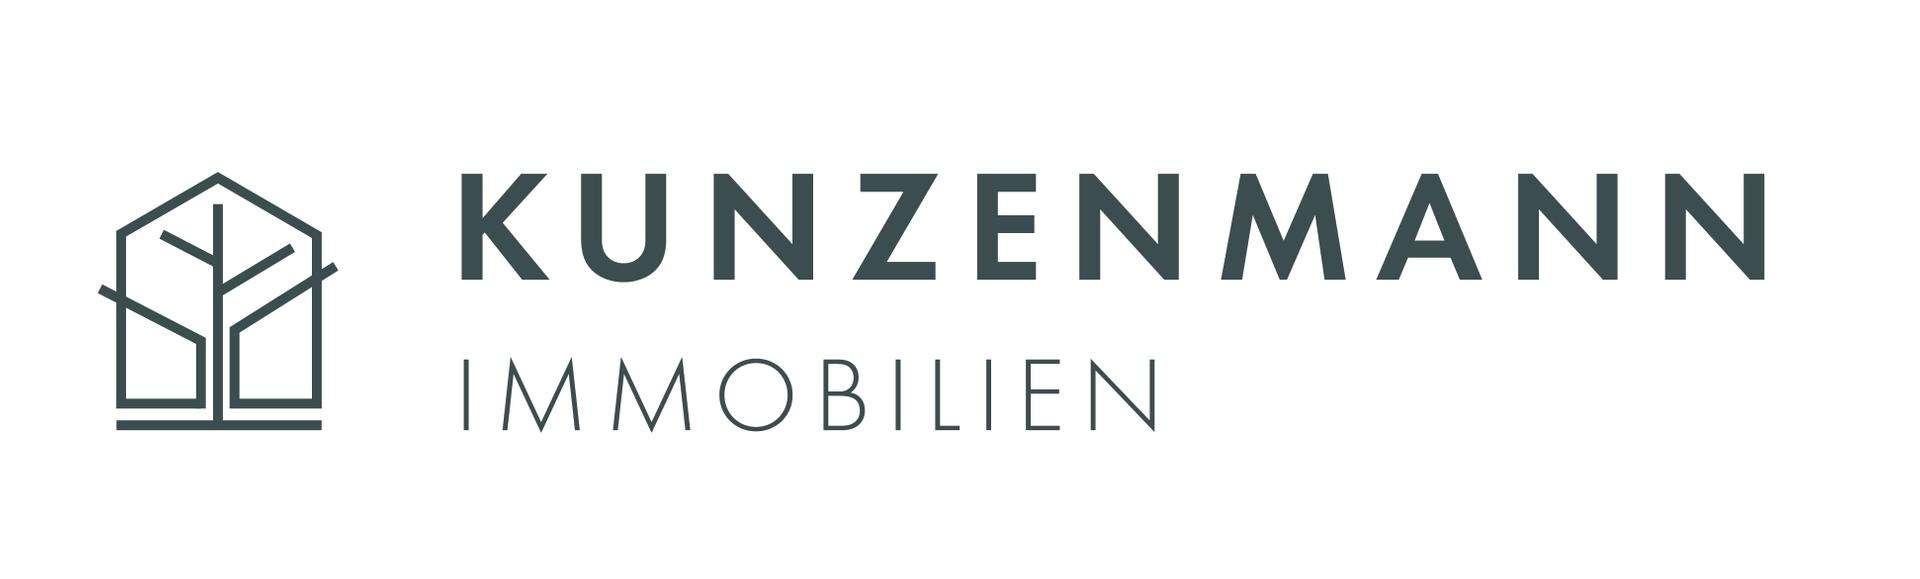 Makler Kunzenmann Immobilien logo